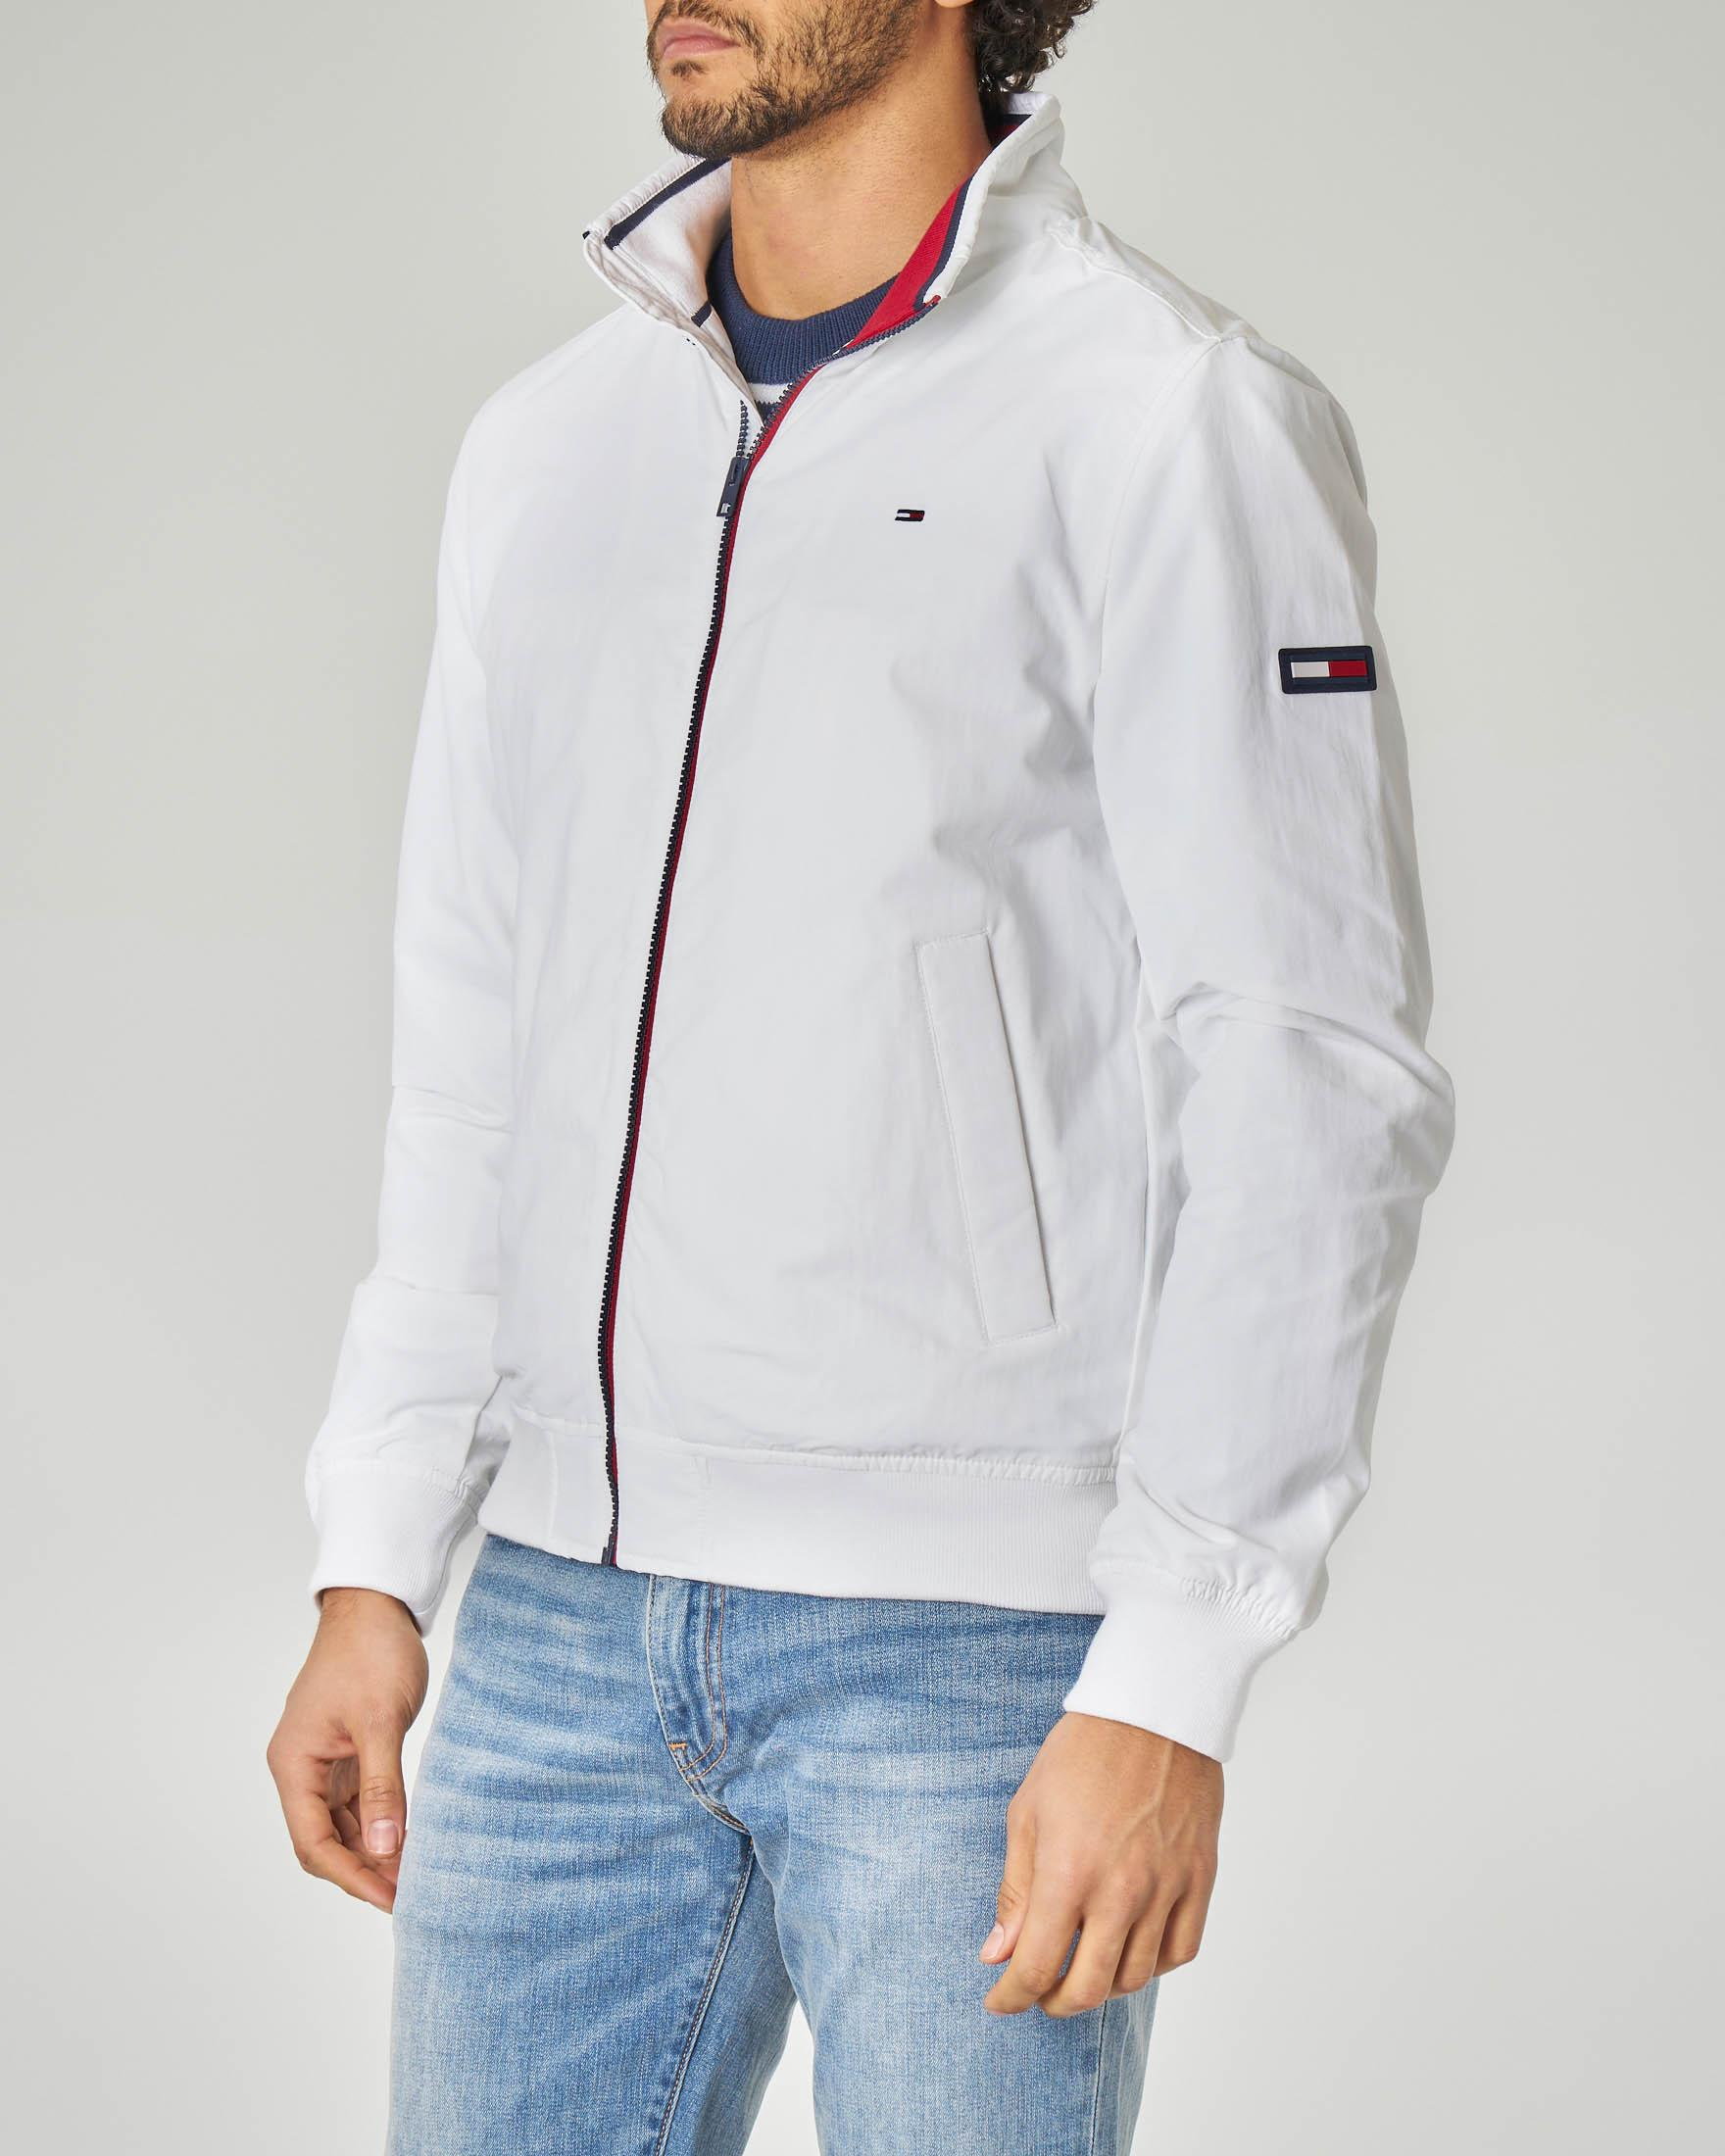 Giacca sailor bianca con zip in contrasto